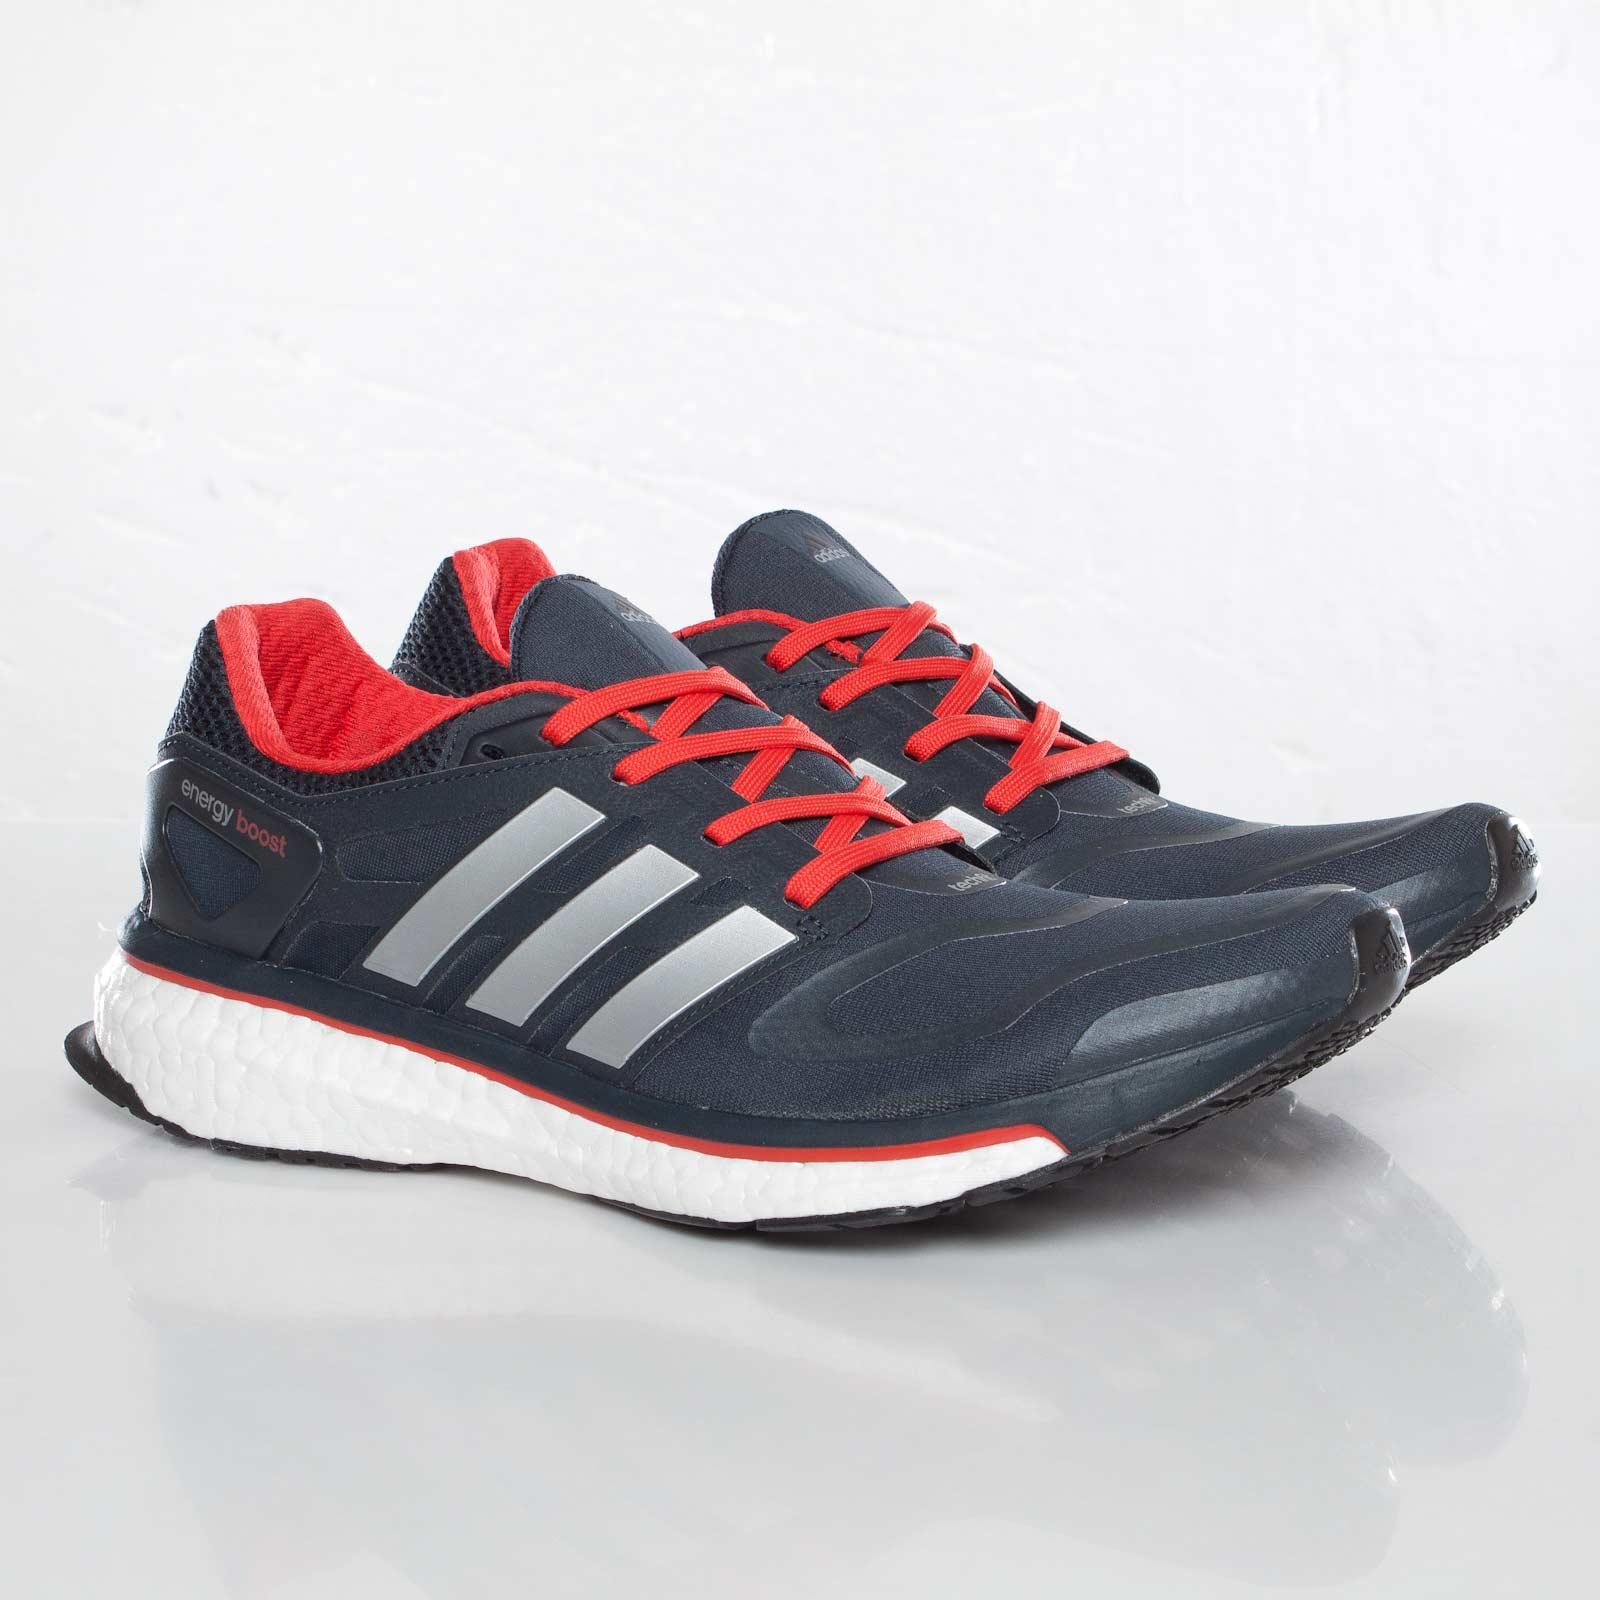 acheter en ligne 44683 53da9 adidas Energy Boost M - G97561 - Sneakersnstuff | sneakers ...